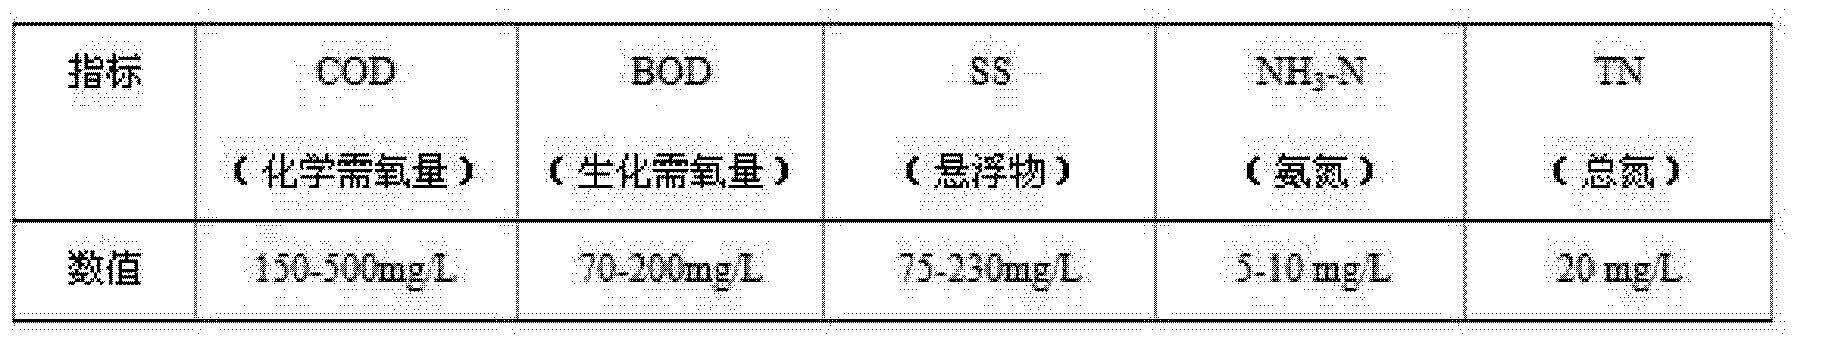 Figure CN203794737UD00031